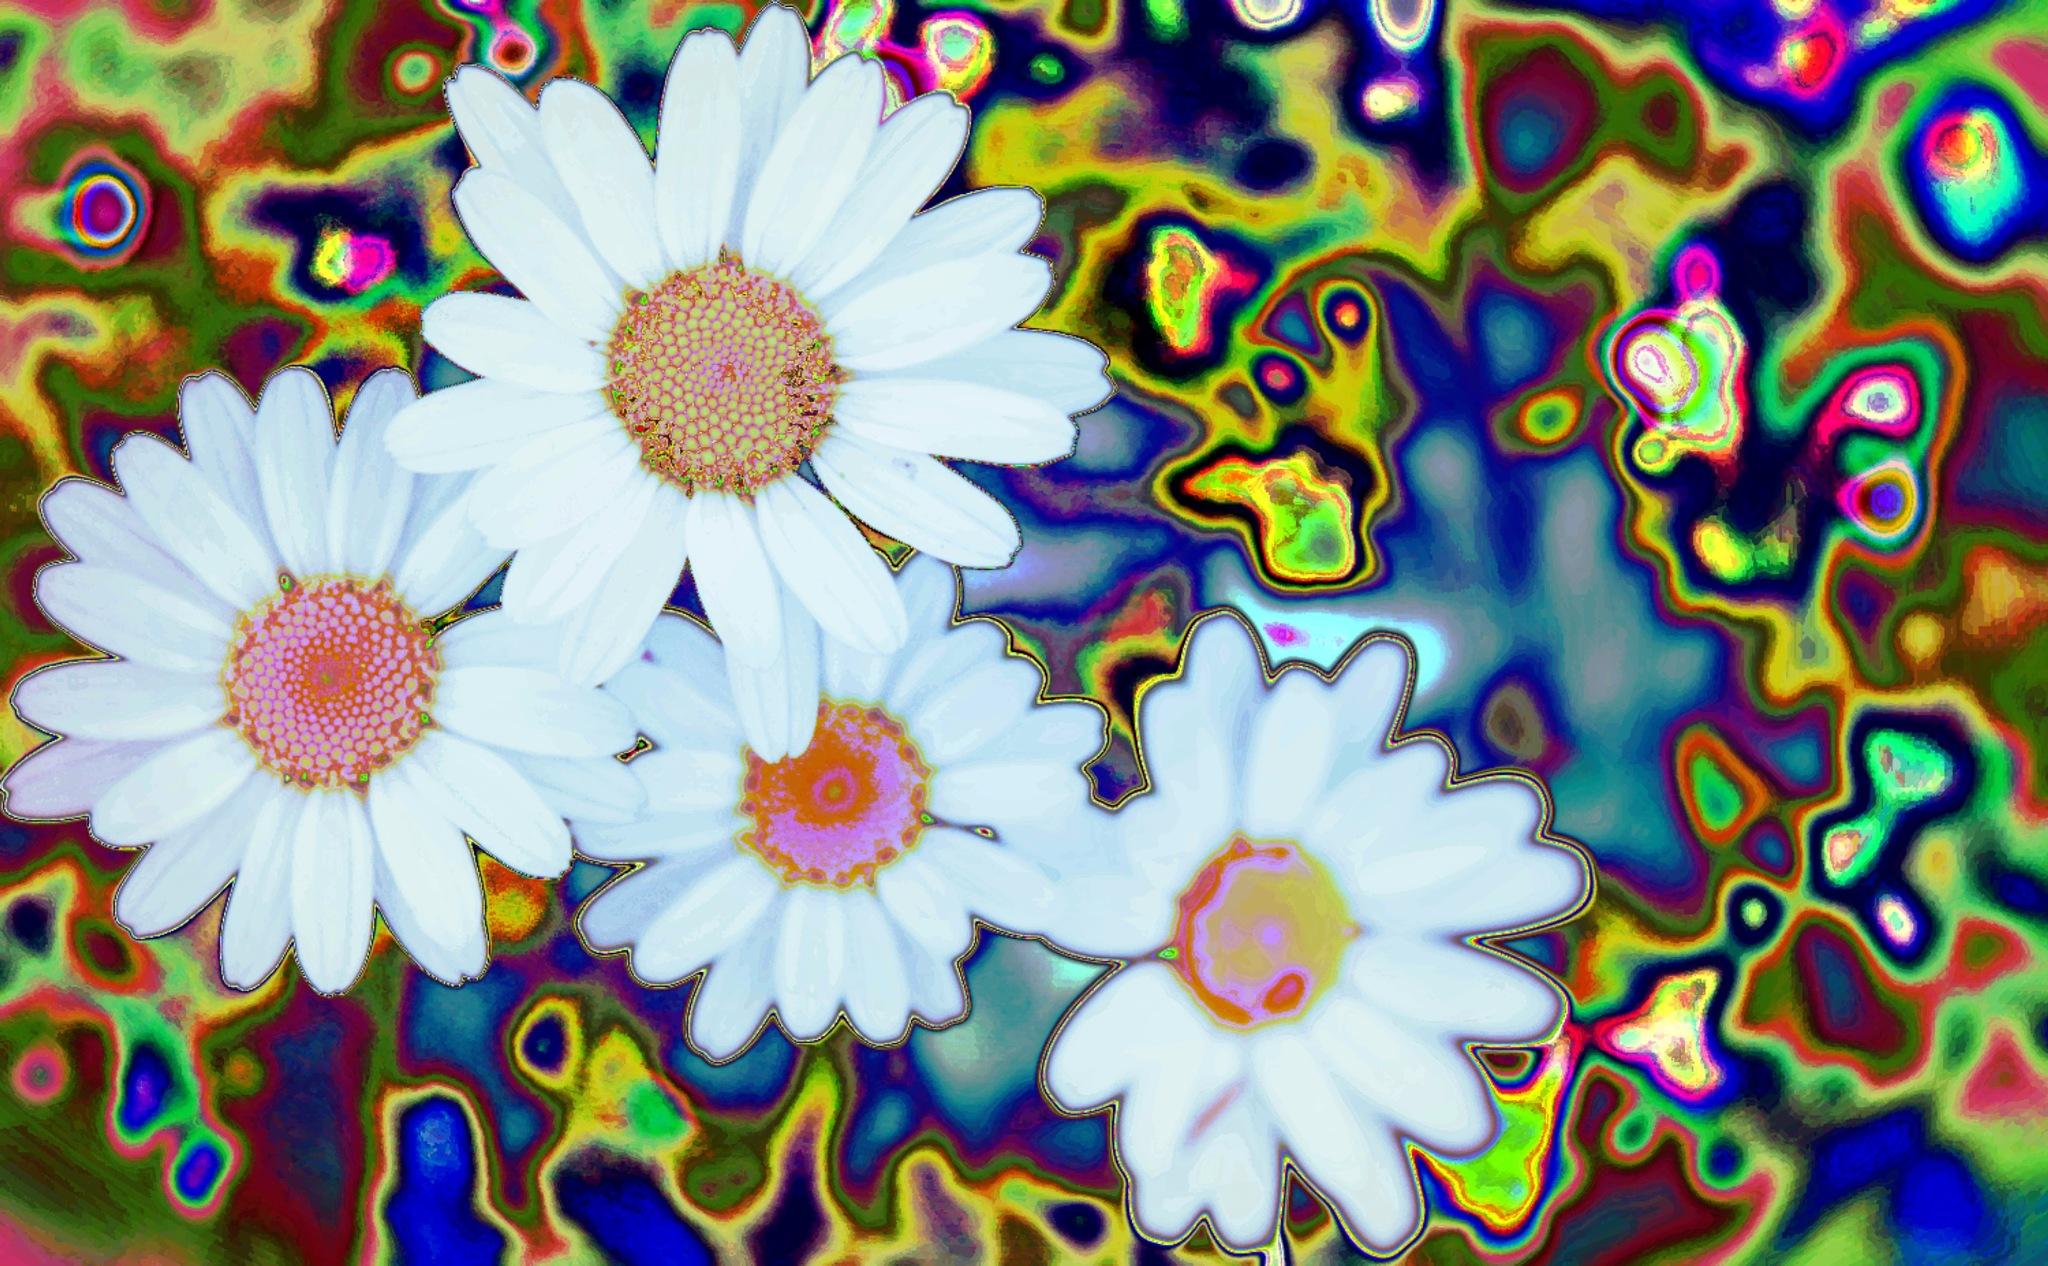 Daisy in Wonderland by LoryC